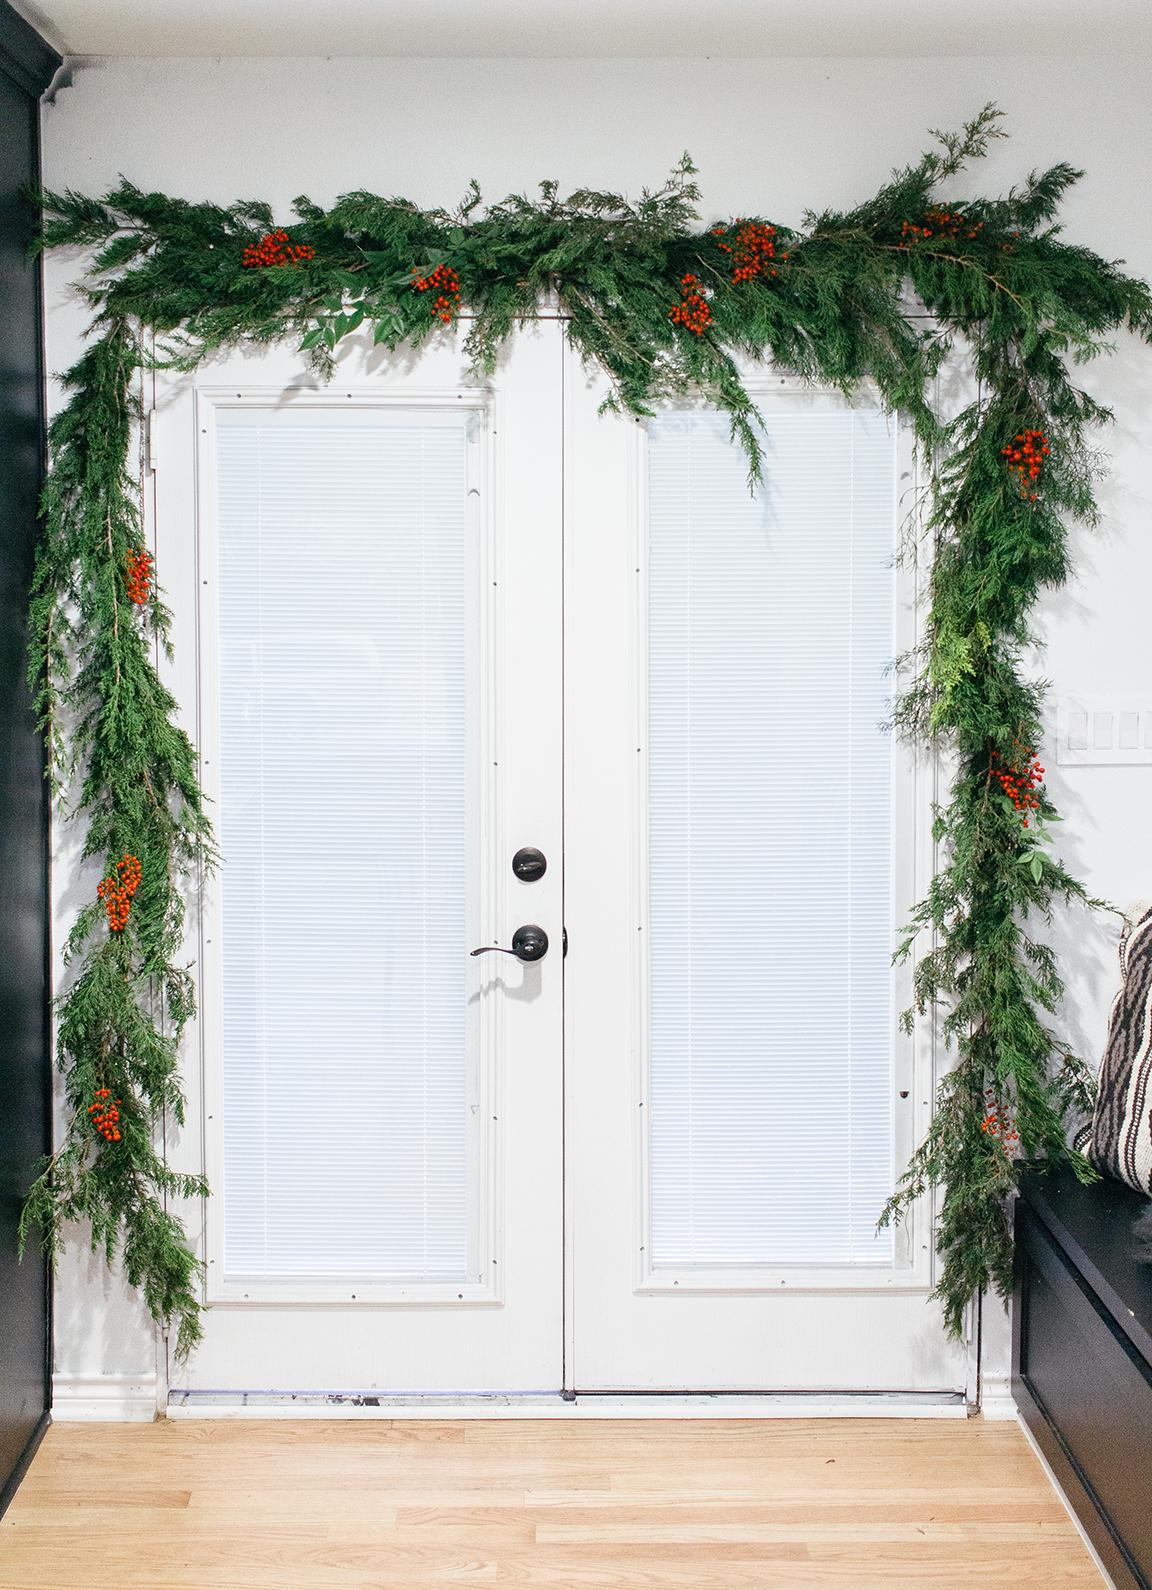 Minimal Imperfect Christmas